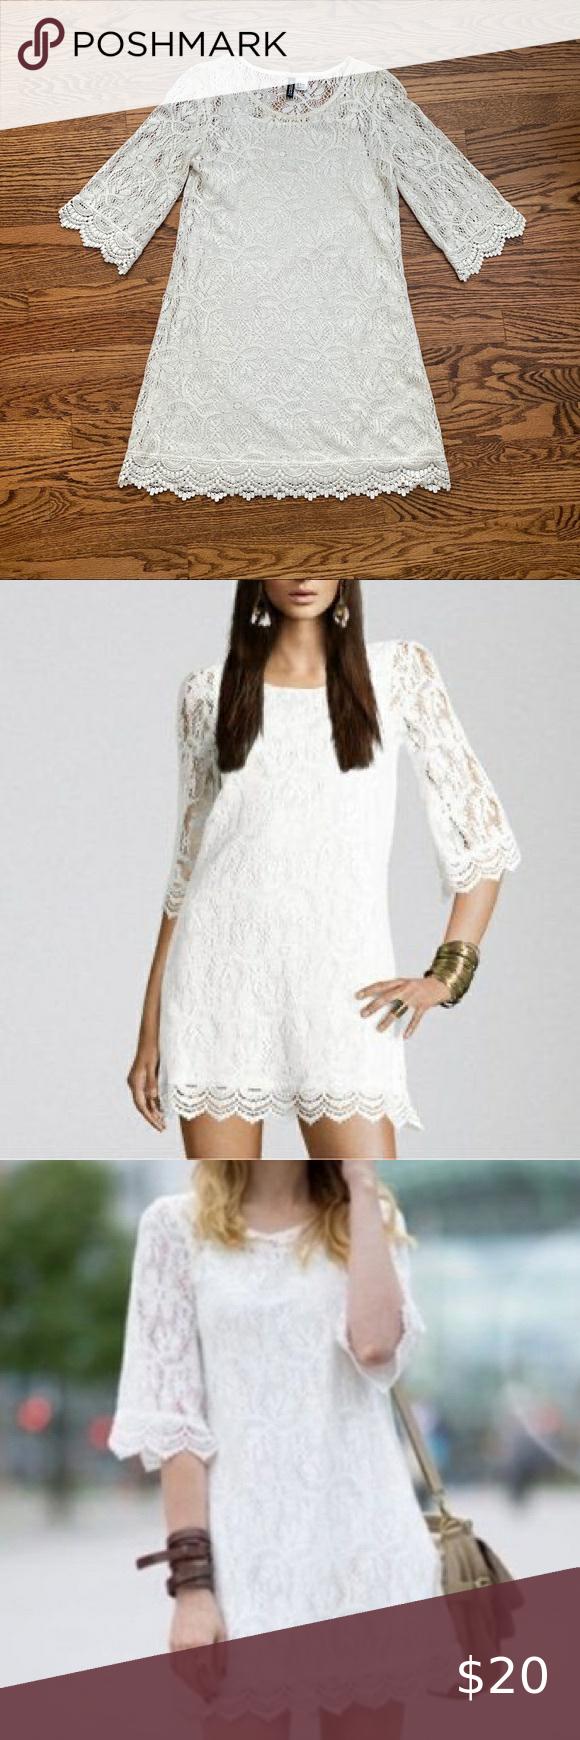 Women S White Lace Shift Dress H M White Lace Shift Dress Lace Shift Dress Shift Dress [ 1740 x 580 Pixel ]